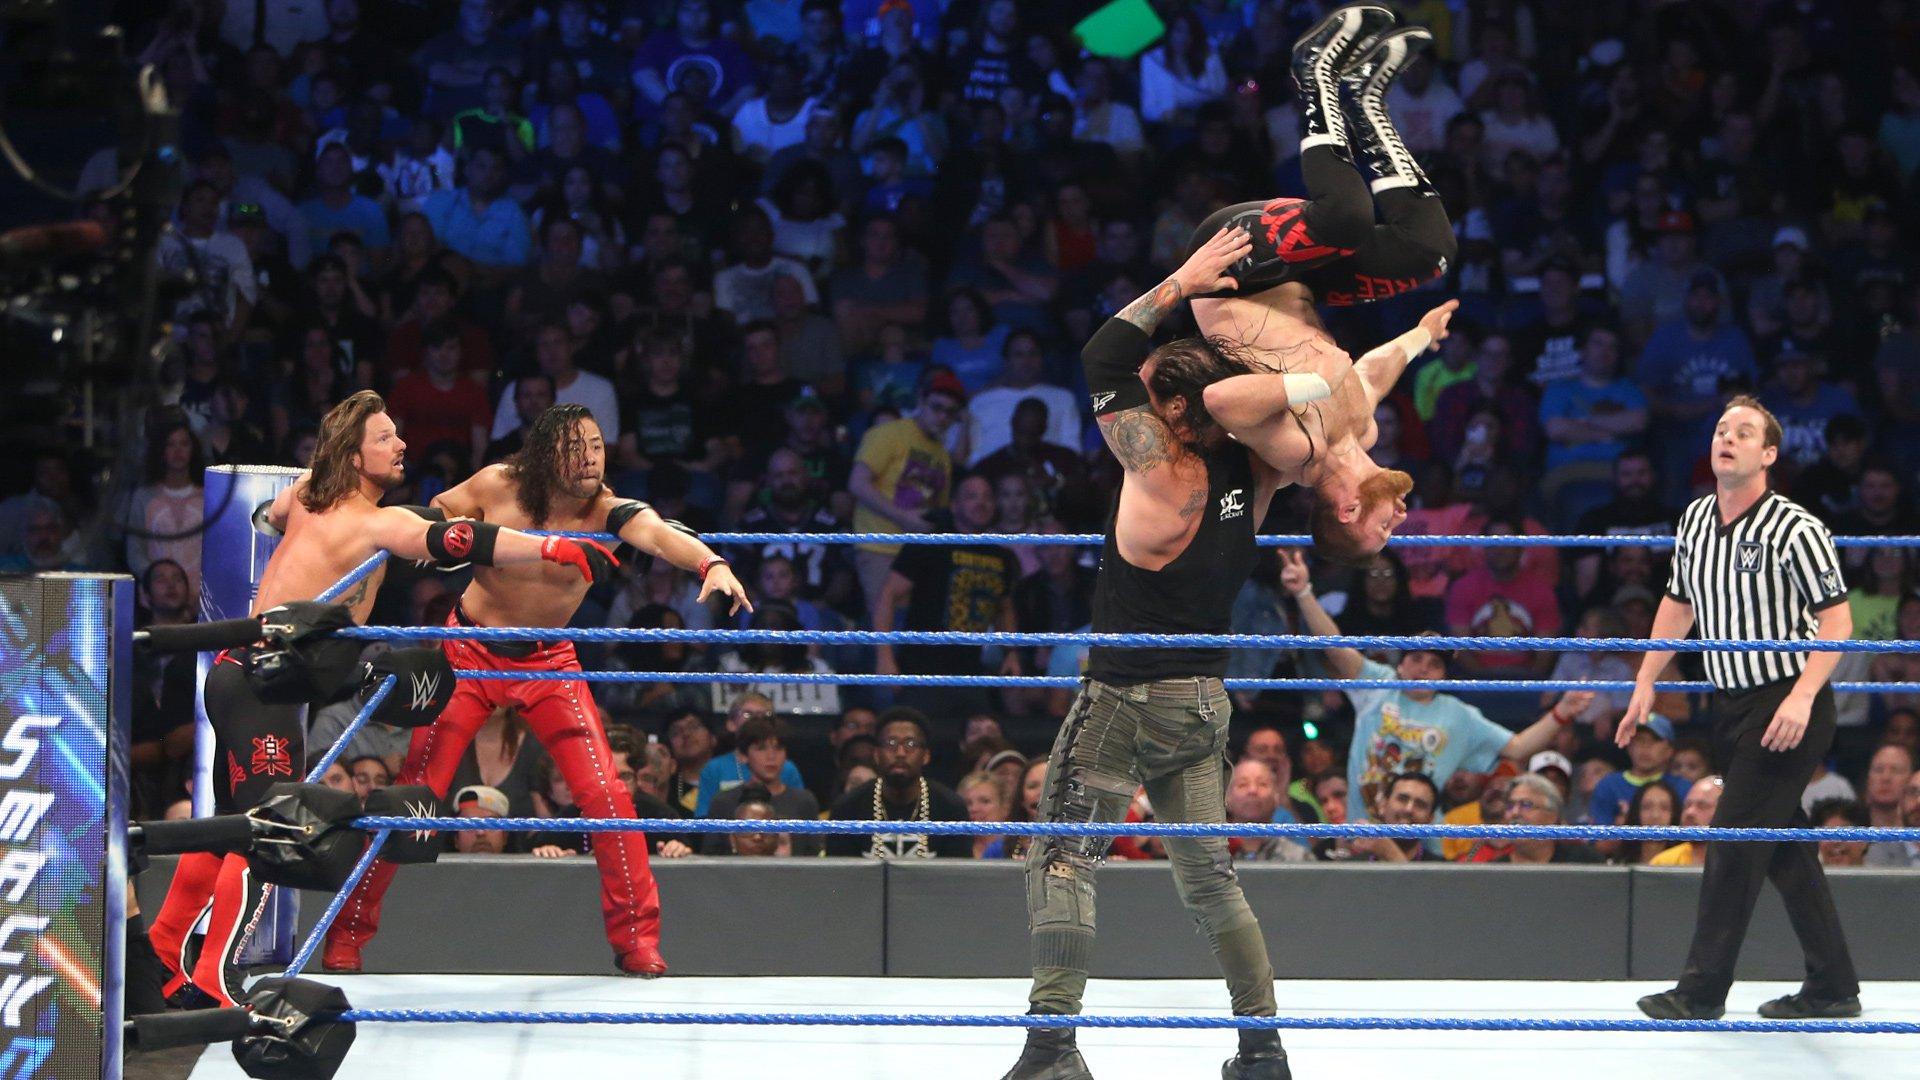 AJ Styles, Shinsuke Nakamura & Sami Zayn vs. Kevin Owens, Baron Corbin & Dolph Ziggler: photos